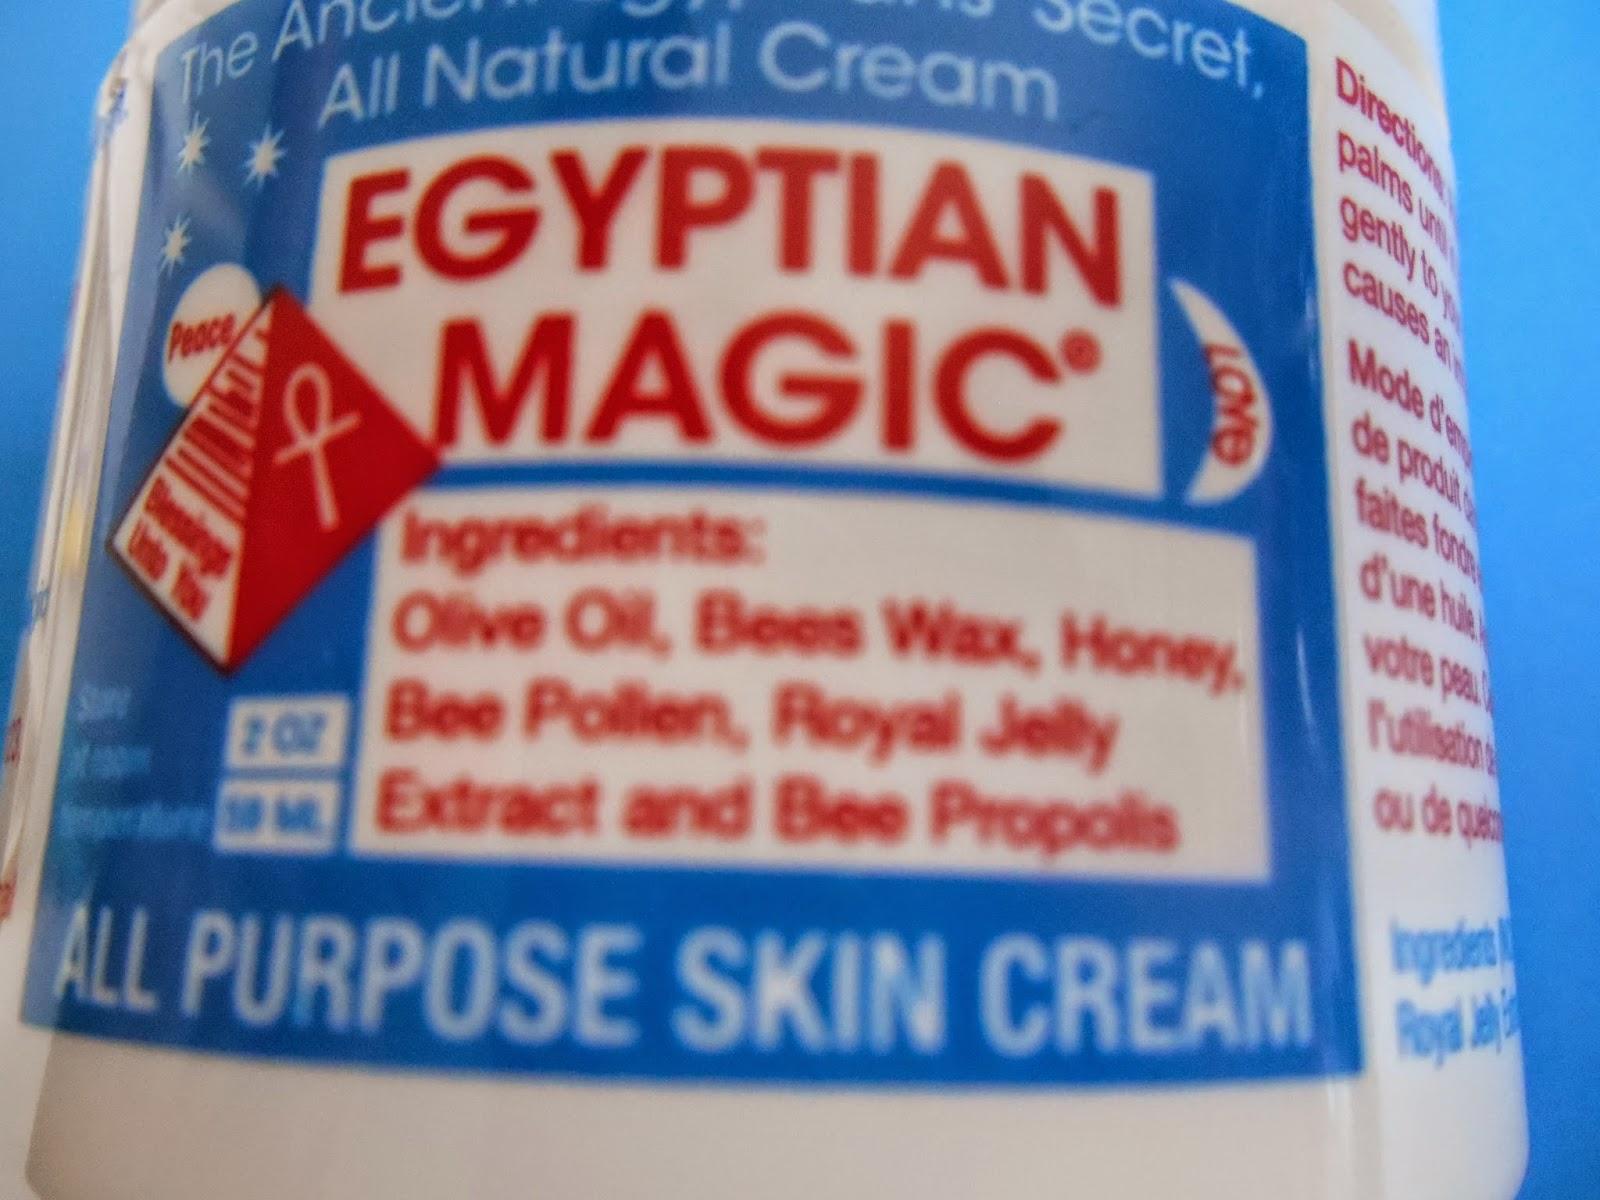 Cr me egyptian magic 25 euros environ les 60 ml 35 - Homeoplasmine coup de soleil ...